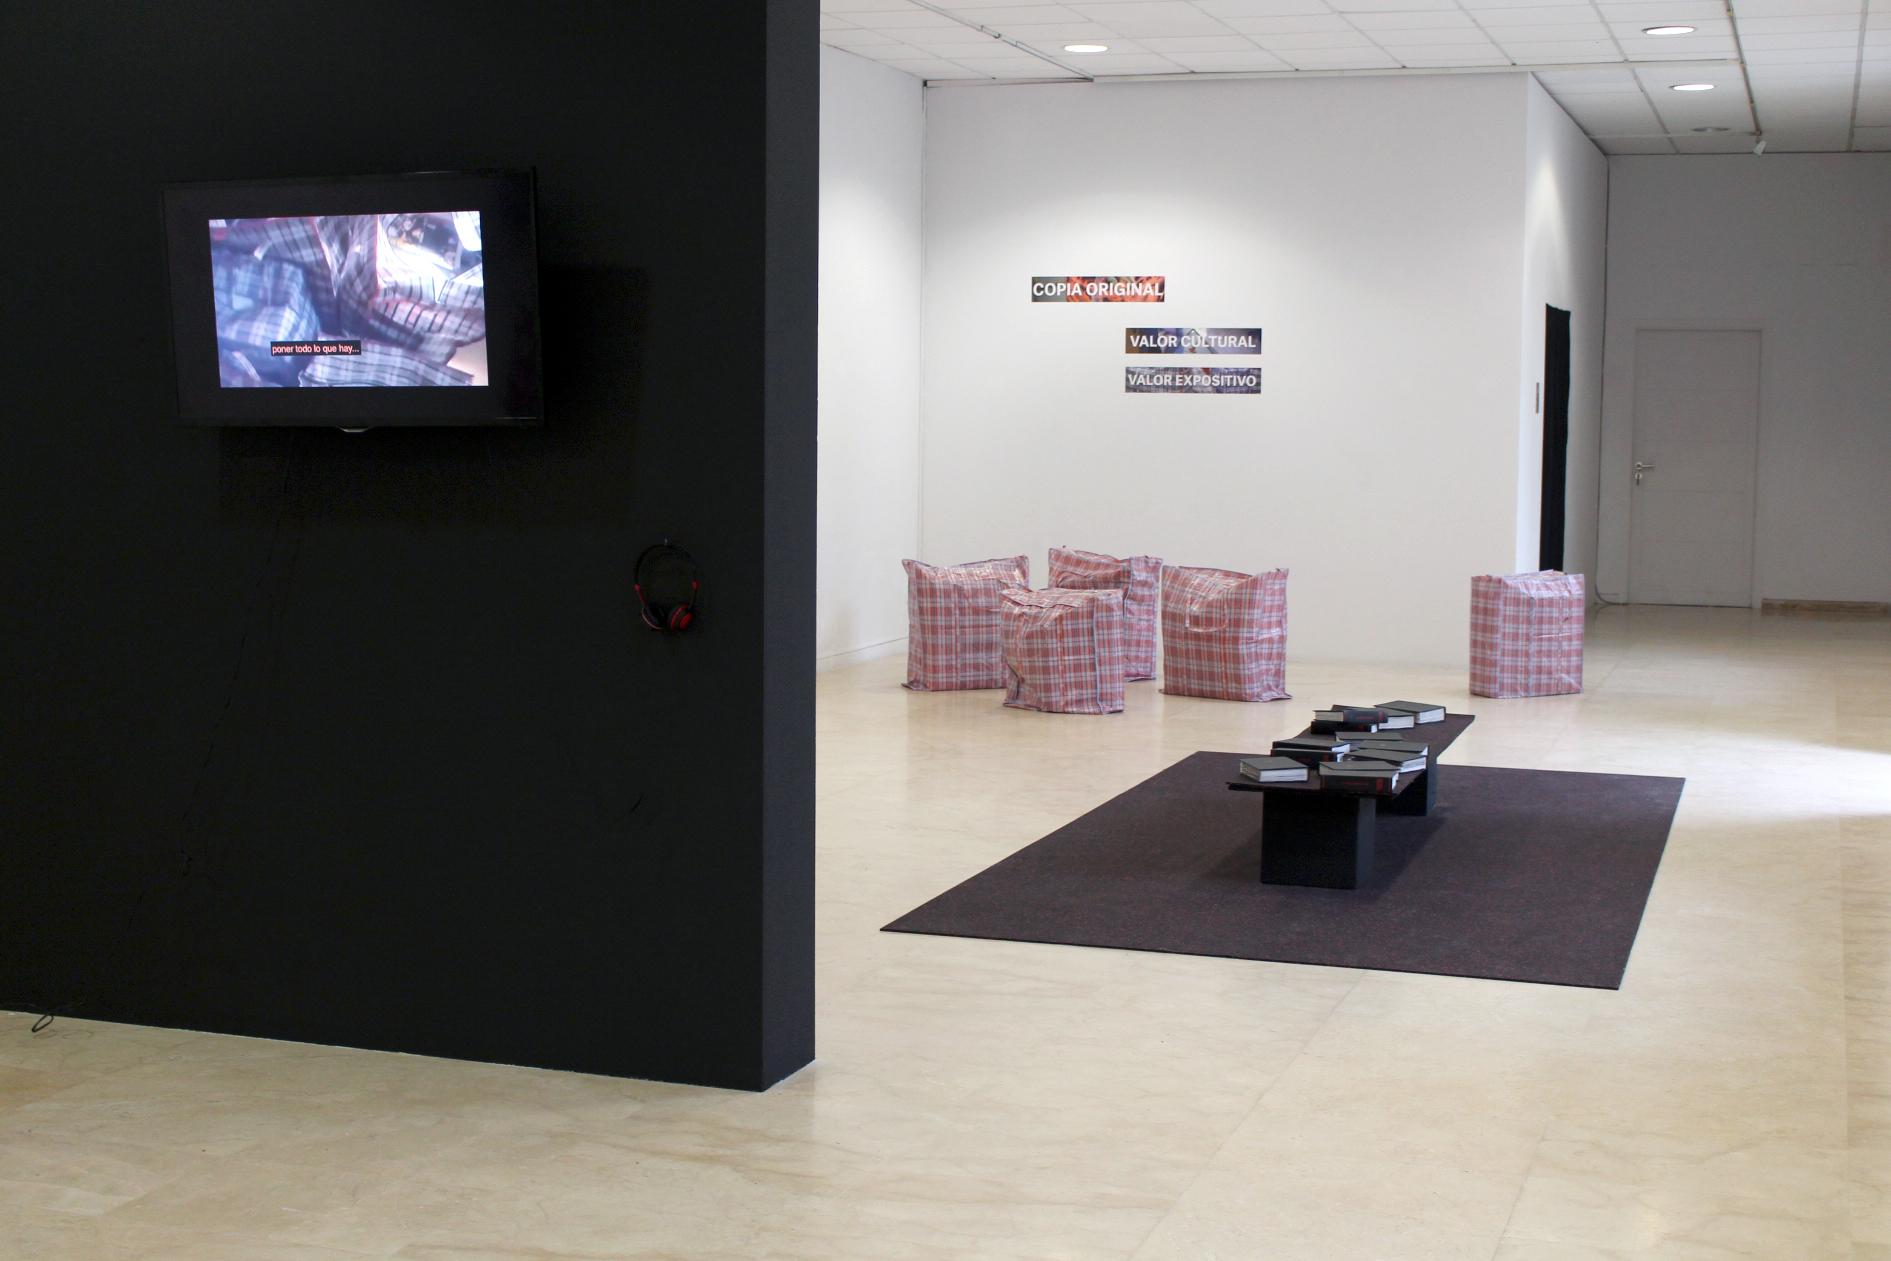 Mondo Trasho, Sala X, Pontevedra, 2019